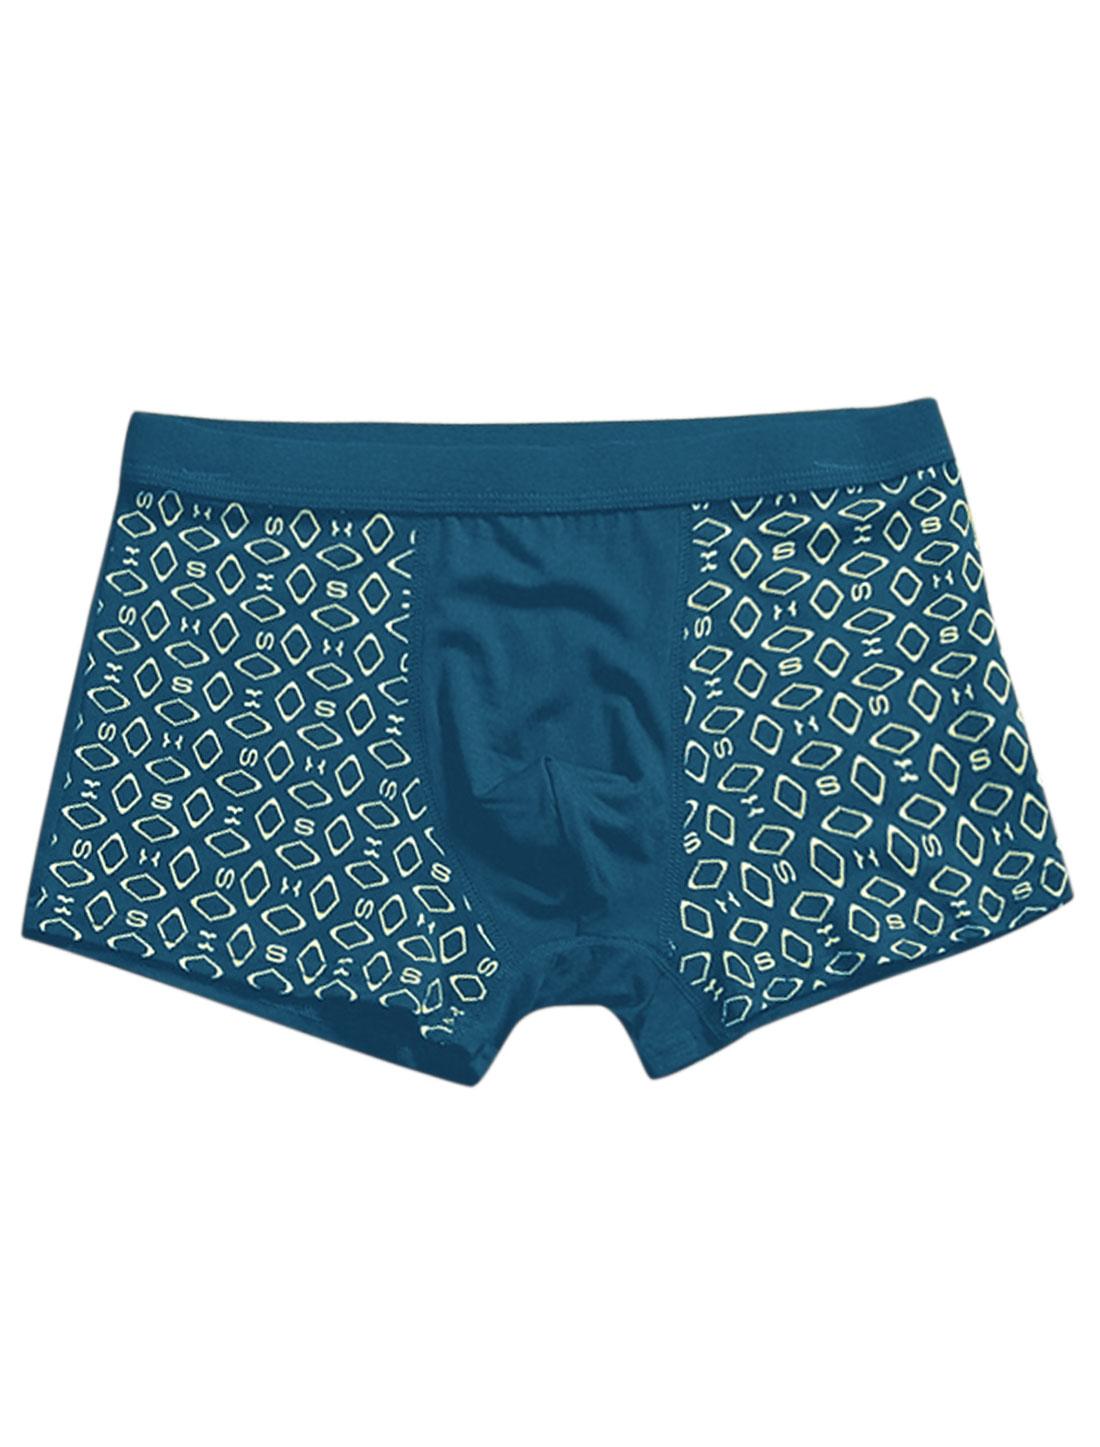 Men Geometric Print Elastic Waist Casual Boxer Brief Turquoise W30